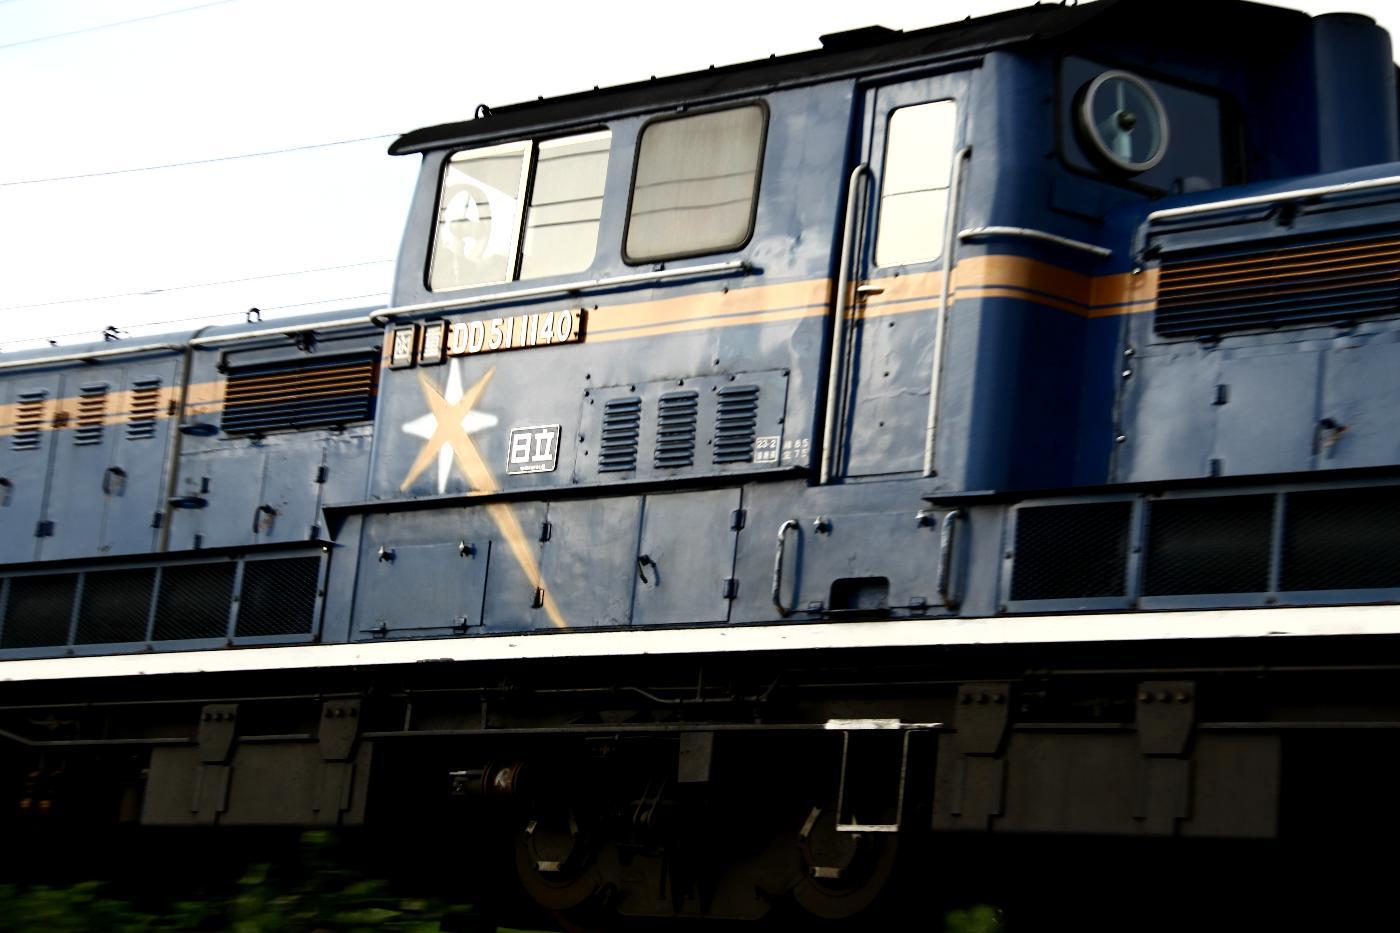 Jr1306160004